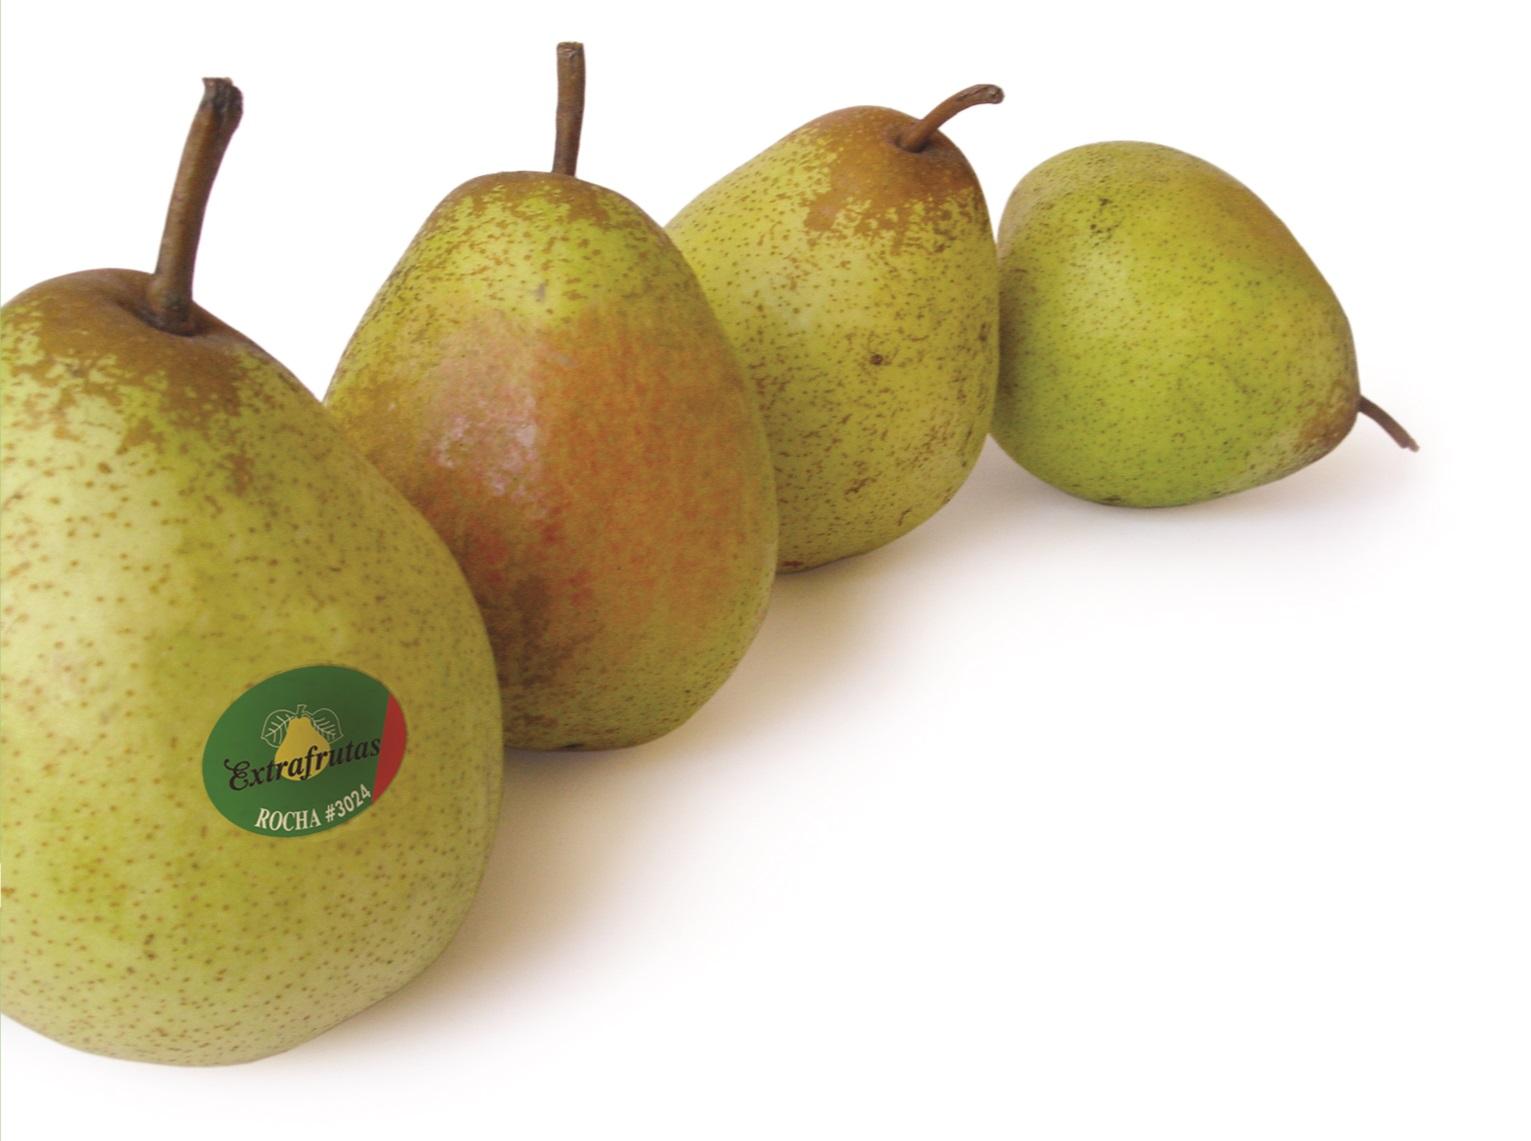 Pêra Rocha Extrafrutas